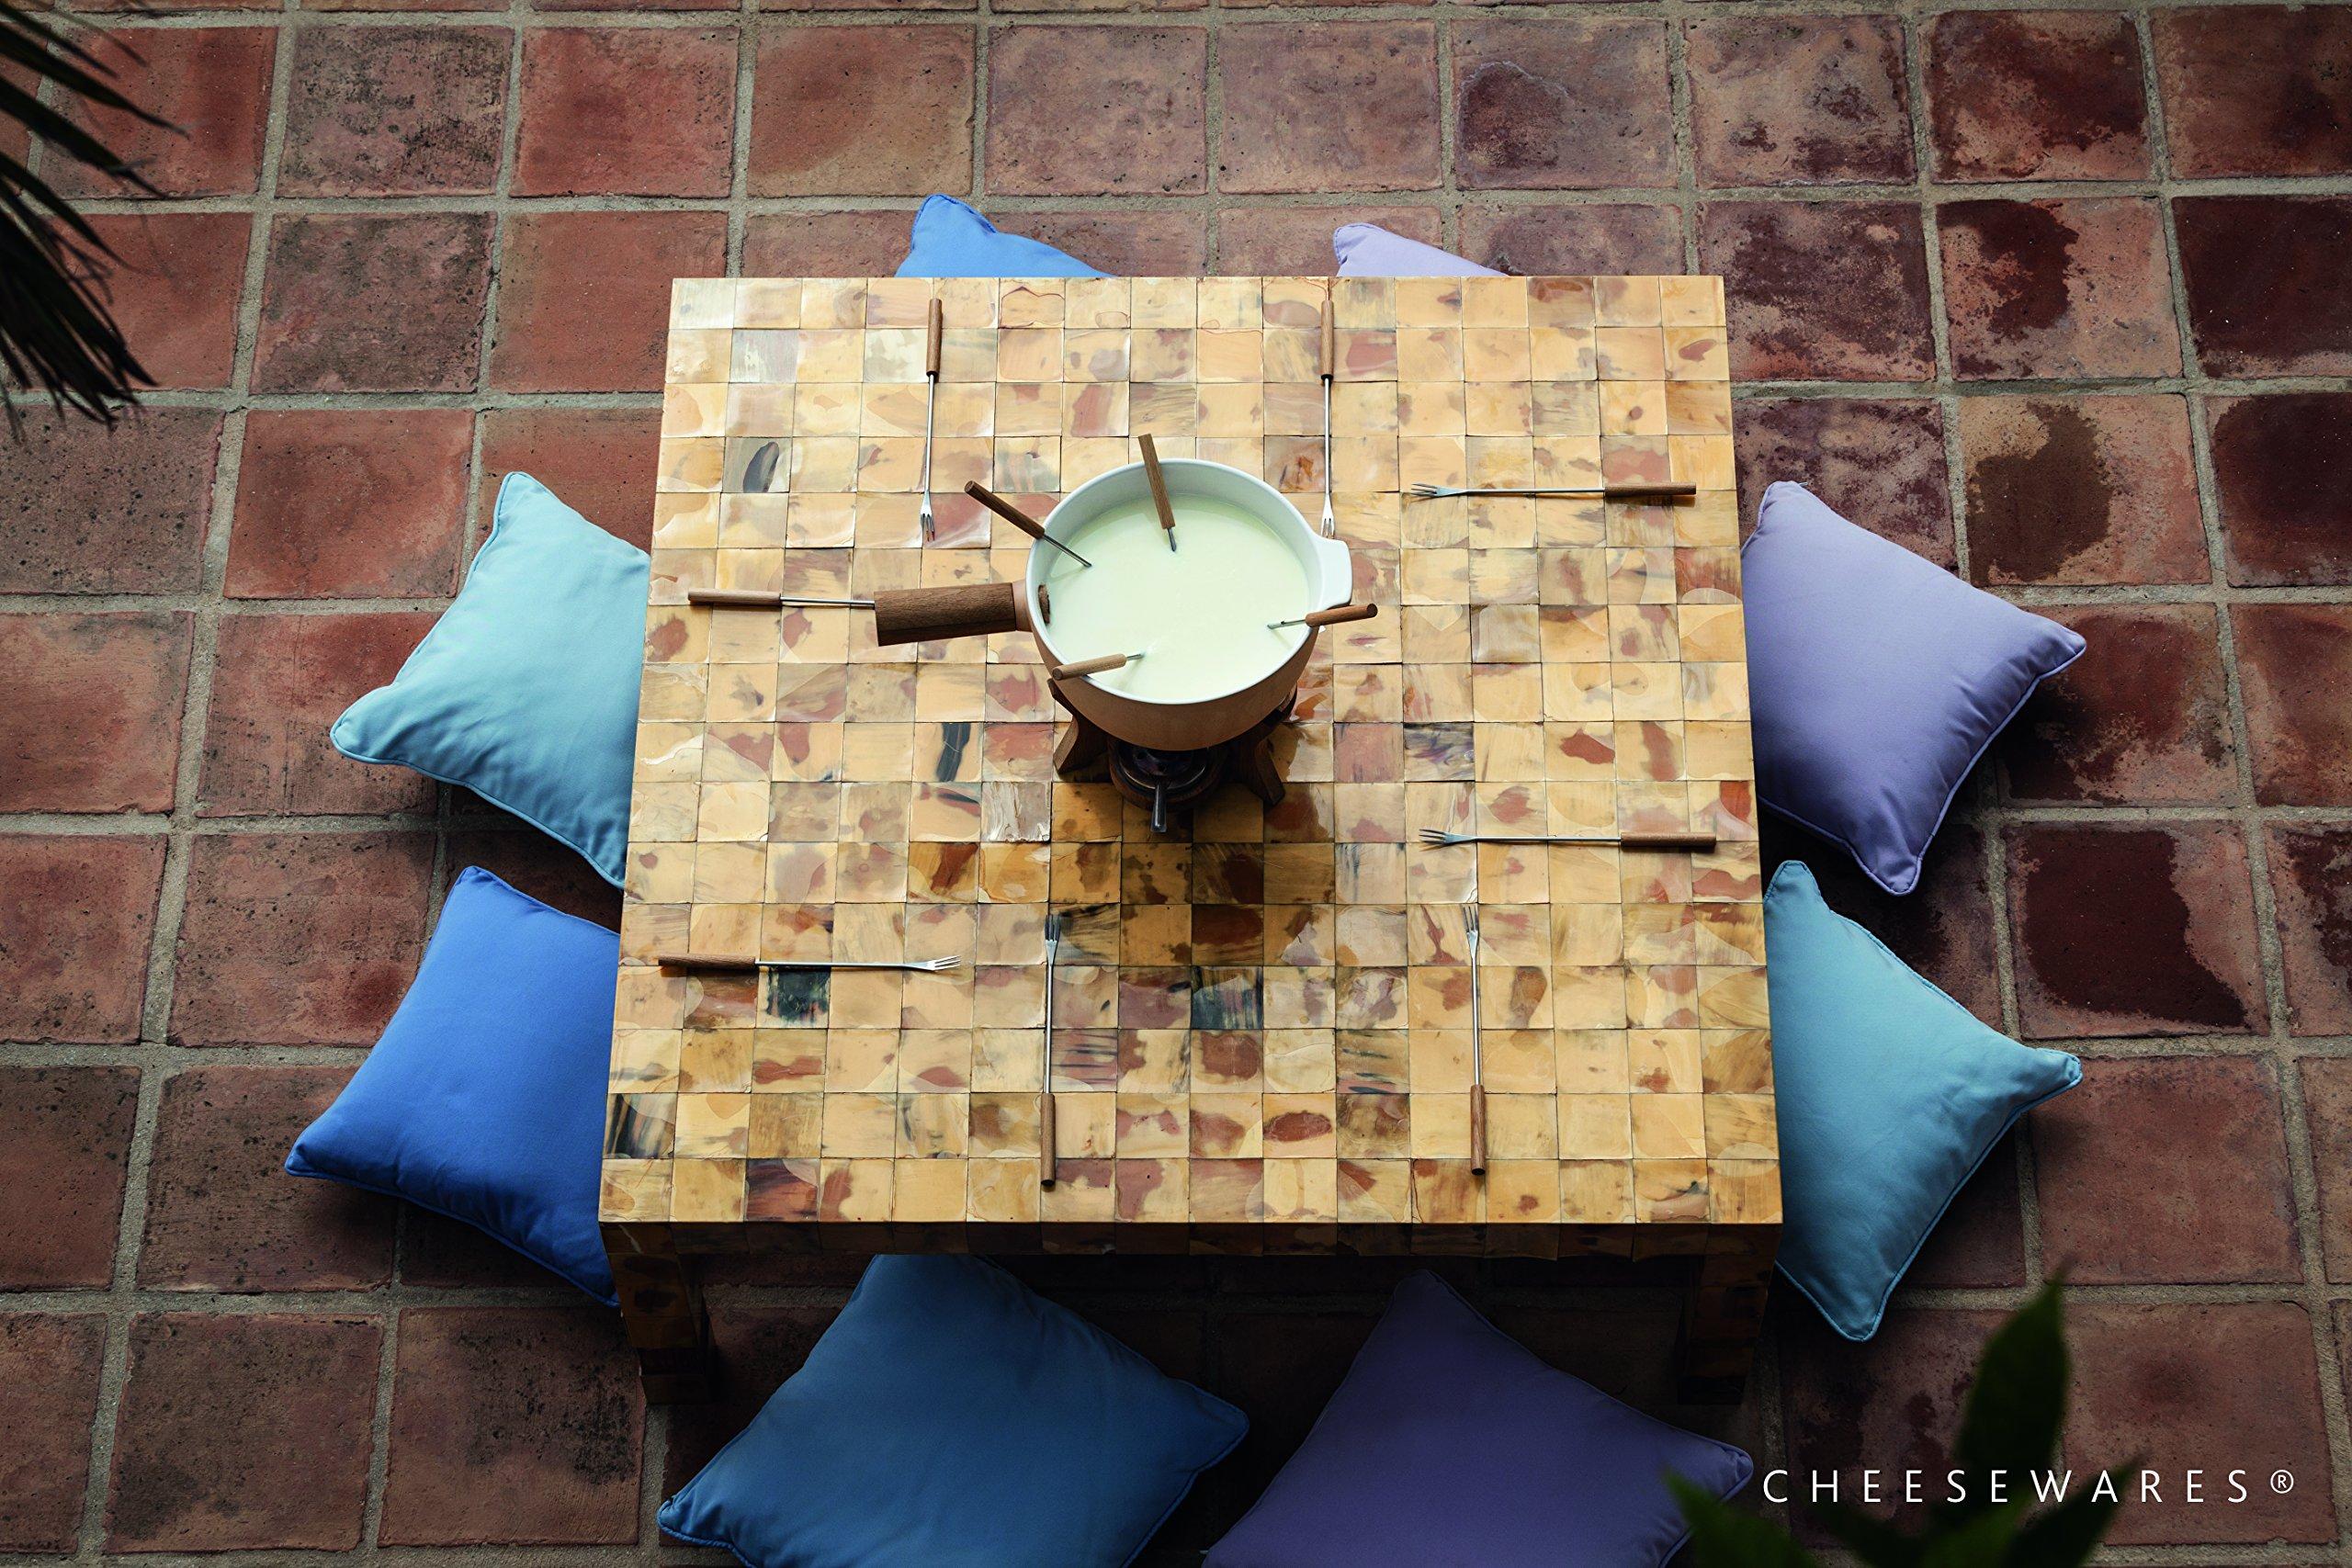 BOSKA Party Fondue Set, 6.5 Liter Stoneware Pot w. Oak Wood Base, 3 Burners, 12 Fondue Forks, Mr Big, Life Collection by Boska Holland